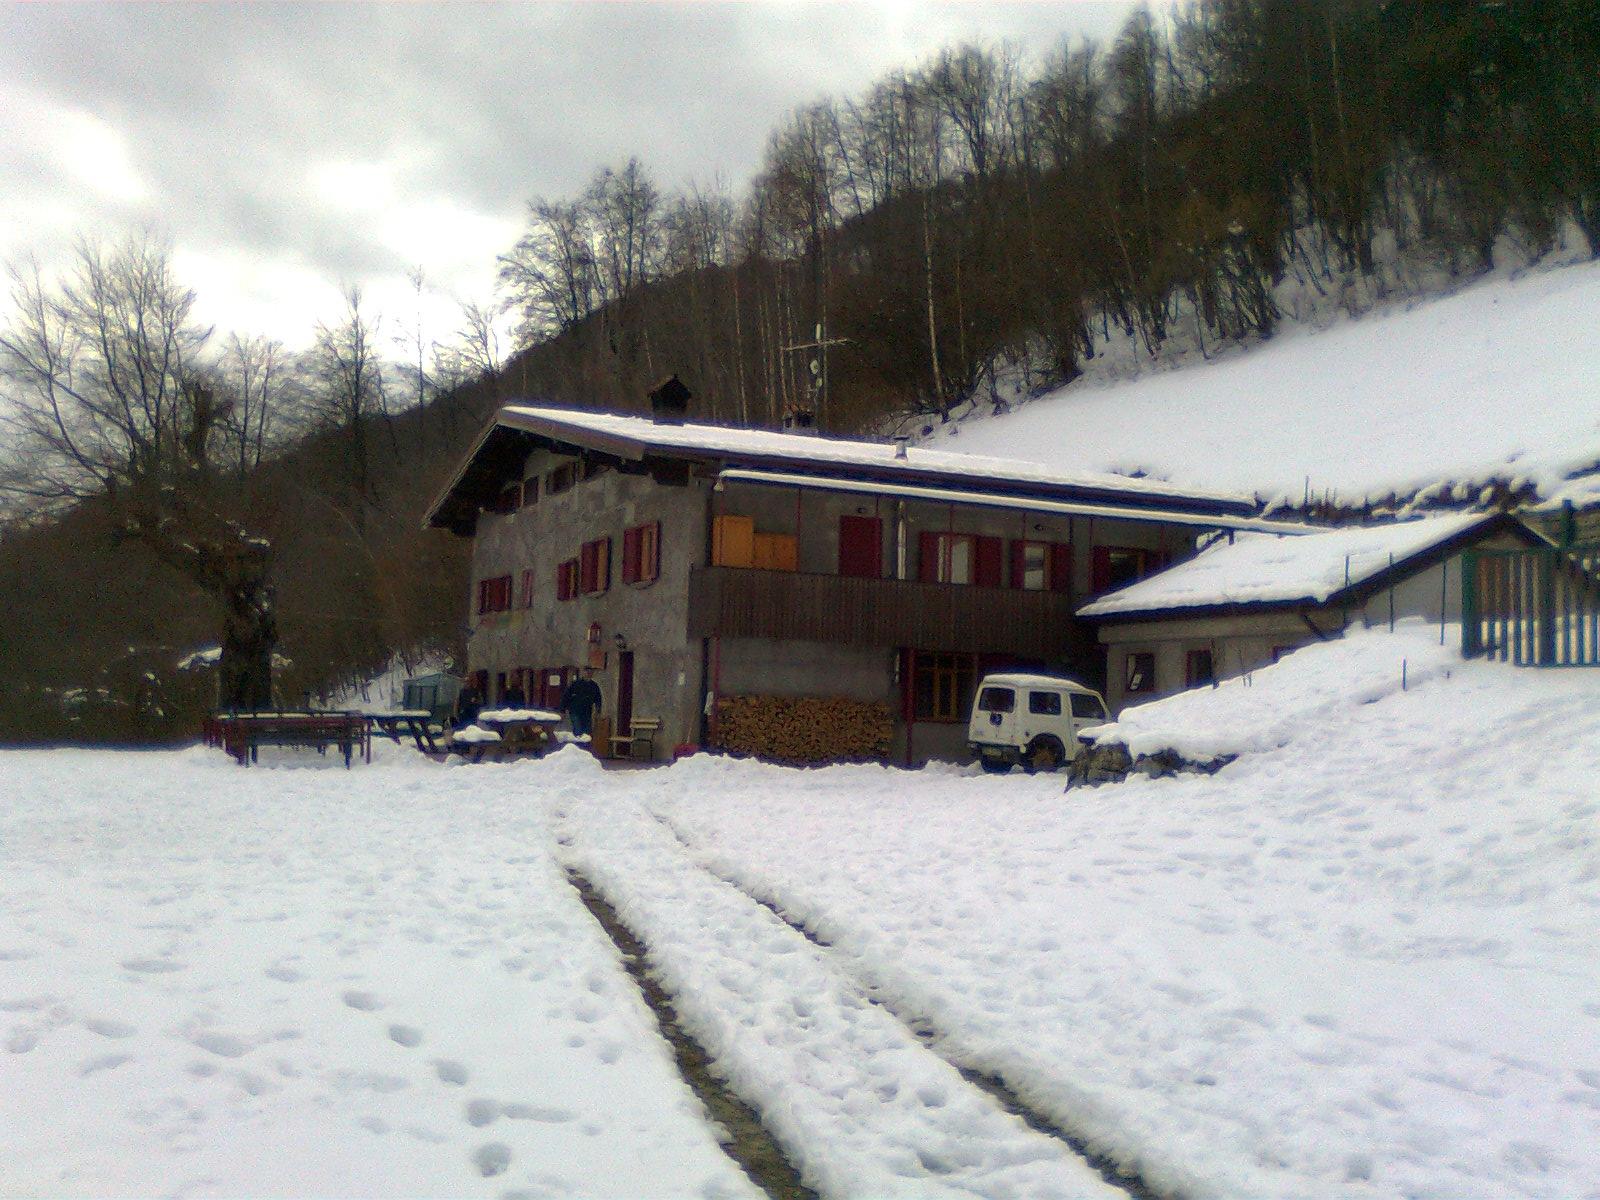 Rifudio Riva Alpe Piattedo Primaluna